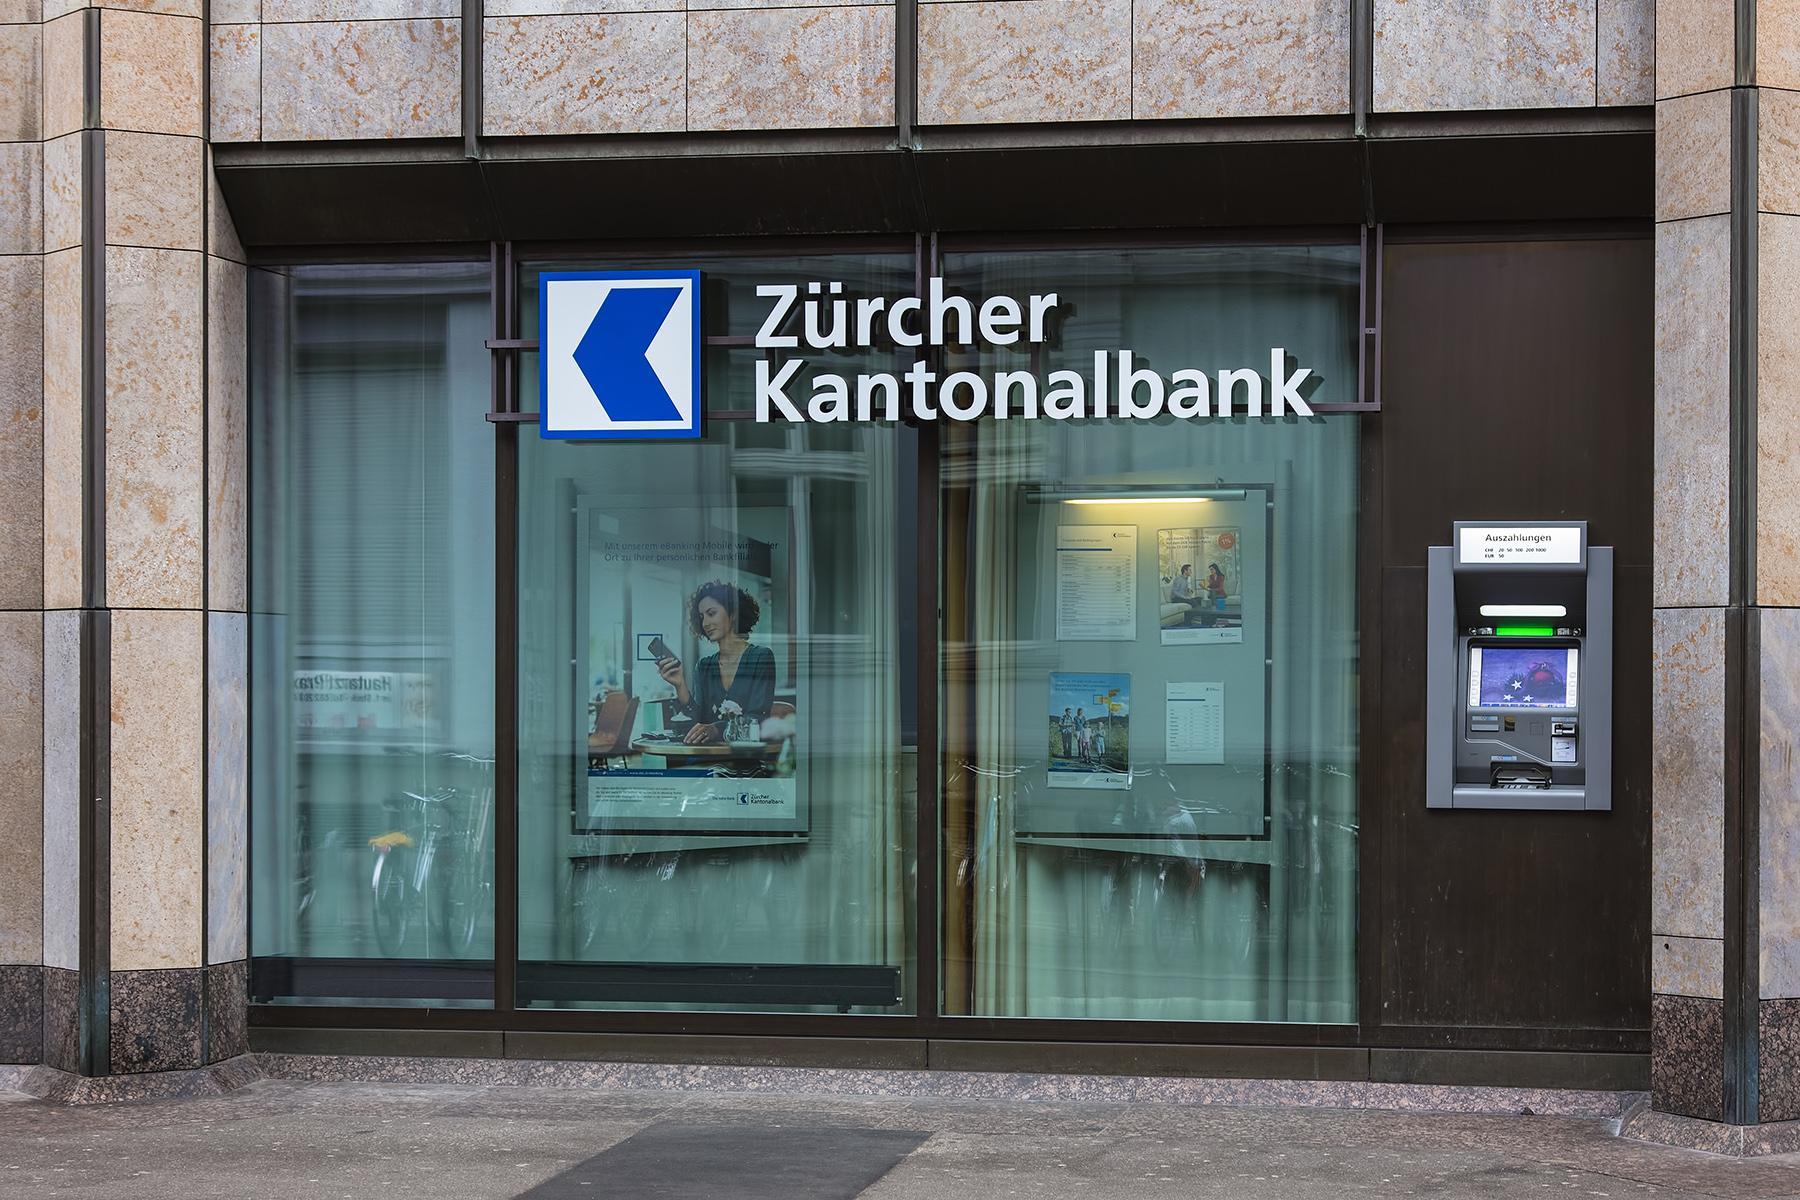 The Zurich Cantonal Bank